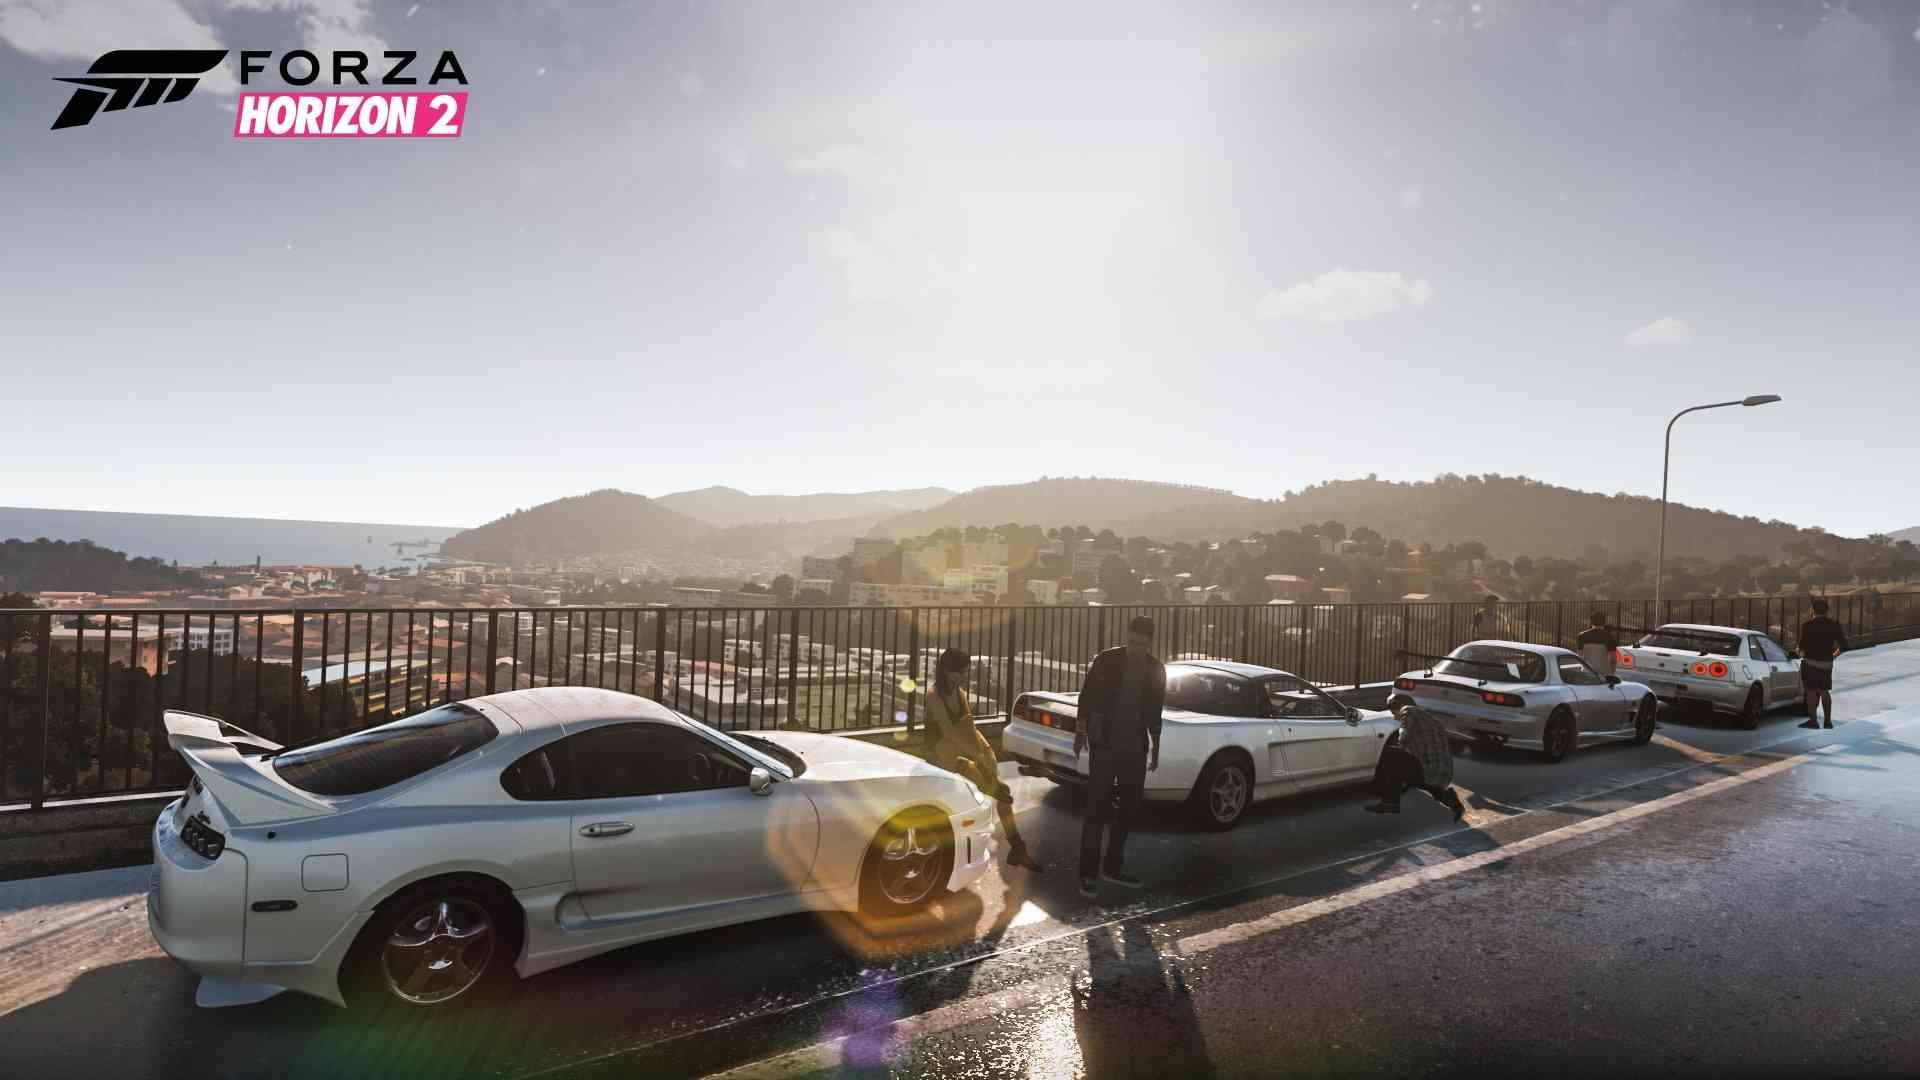 Car Meet Bug Horizon 2 Discussion Forza Motorsport